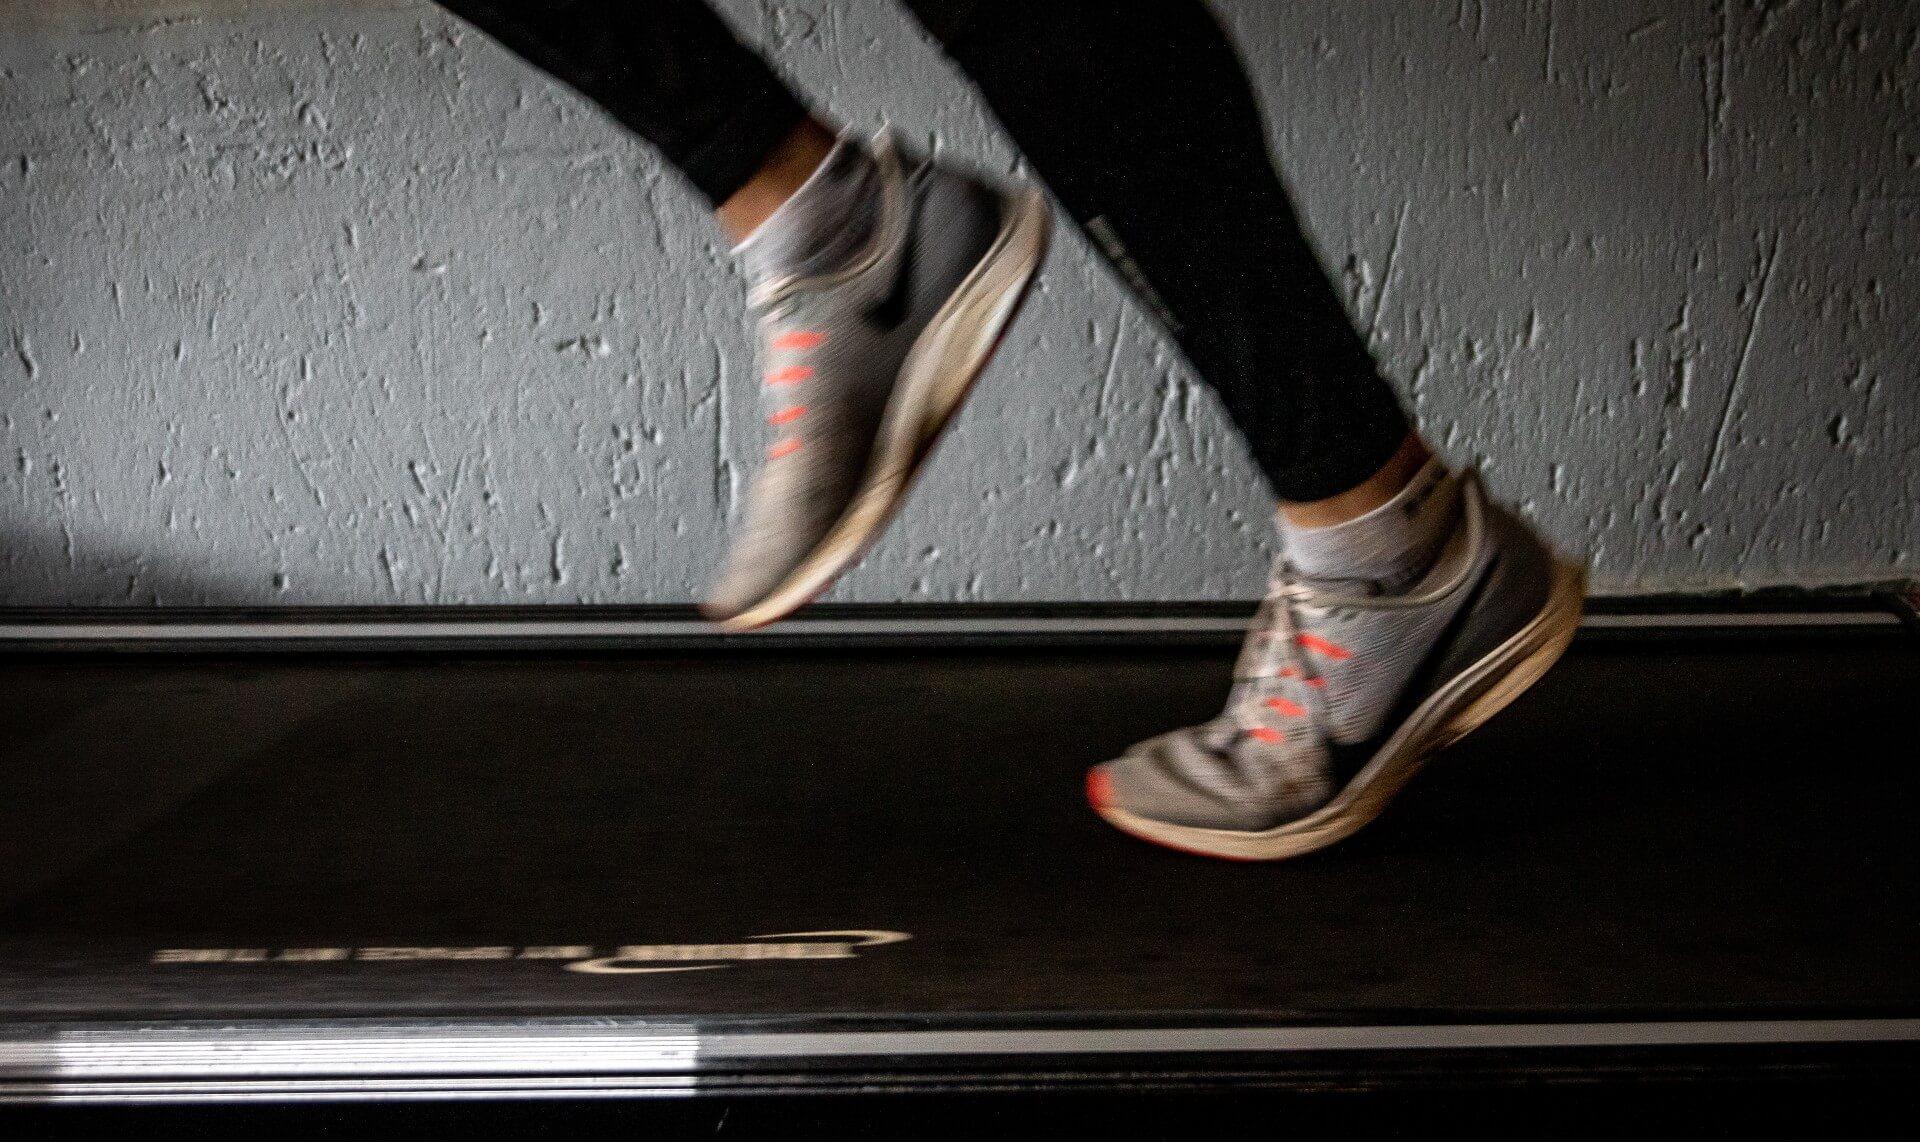 Closeup runner's feet on treadmill